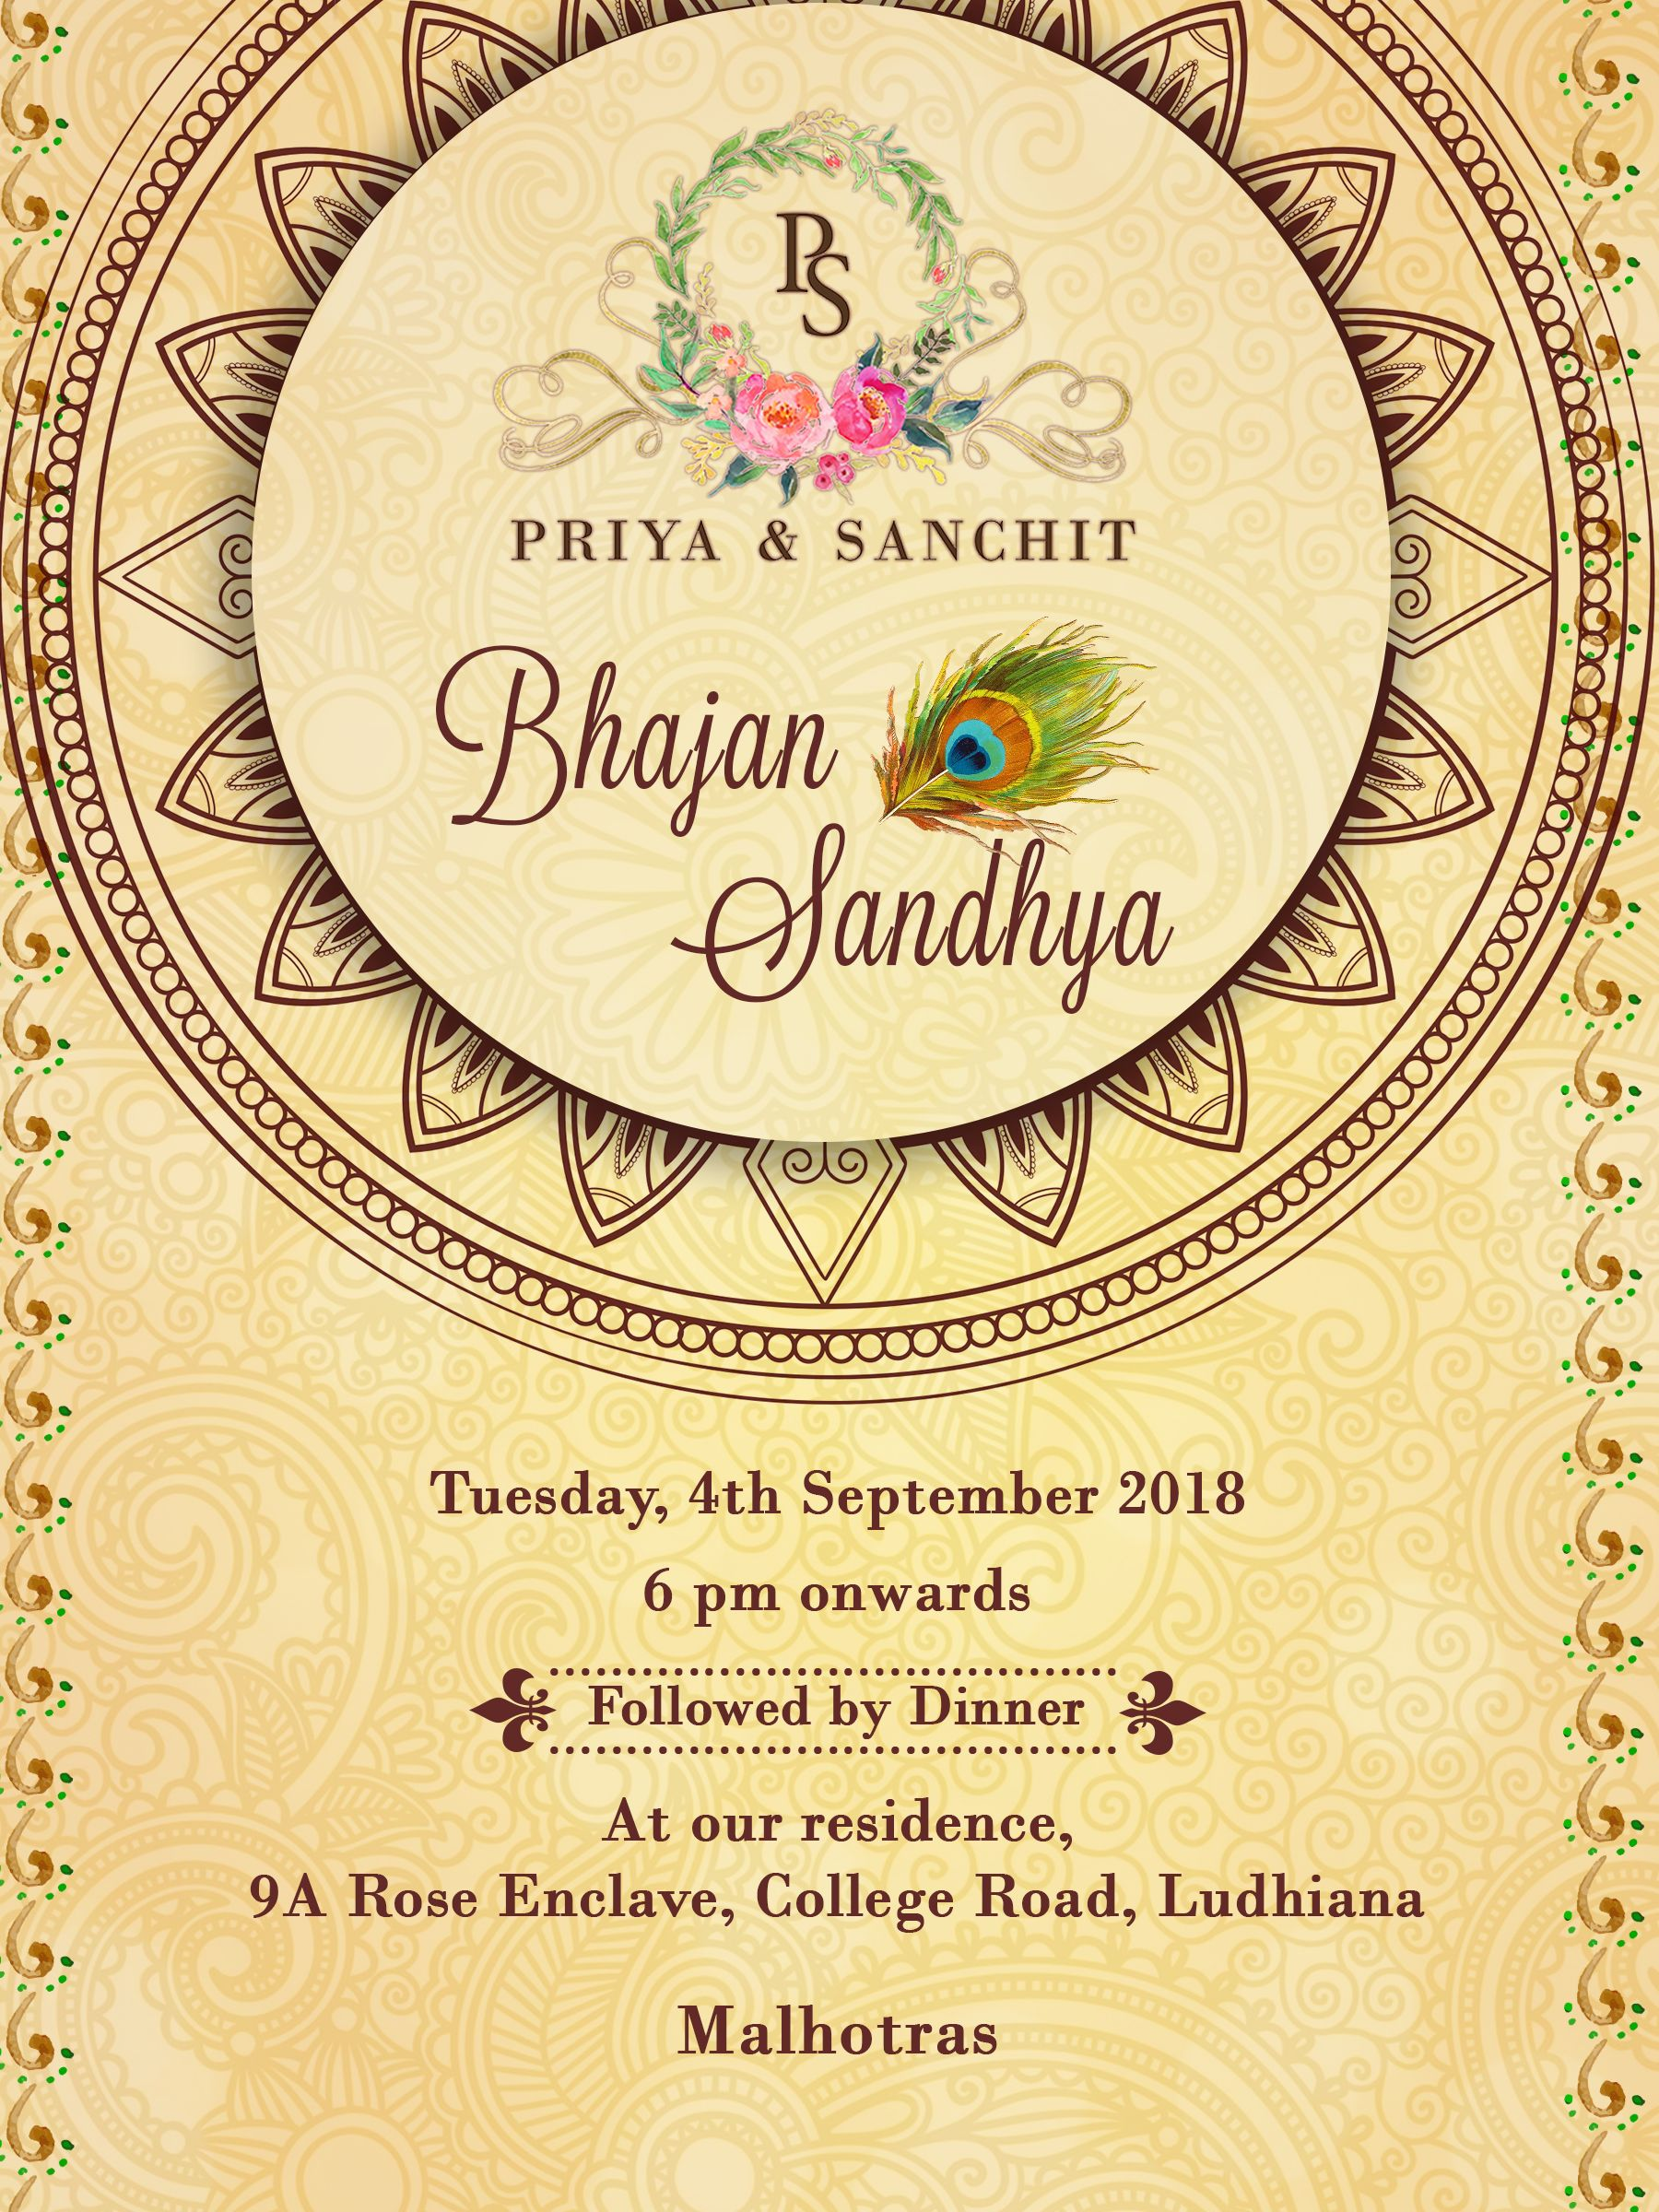 Bhajan Invite Digital Invites Invitation Cards Wedding Invite Simple Wedding Cards Creative Invitations Indian Wedding Cards